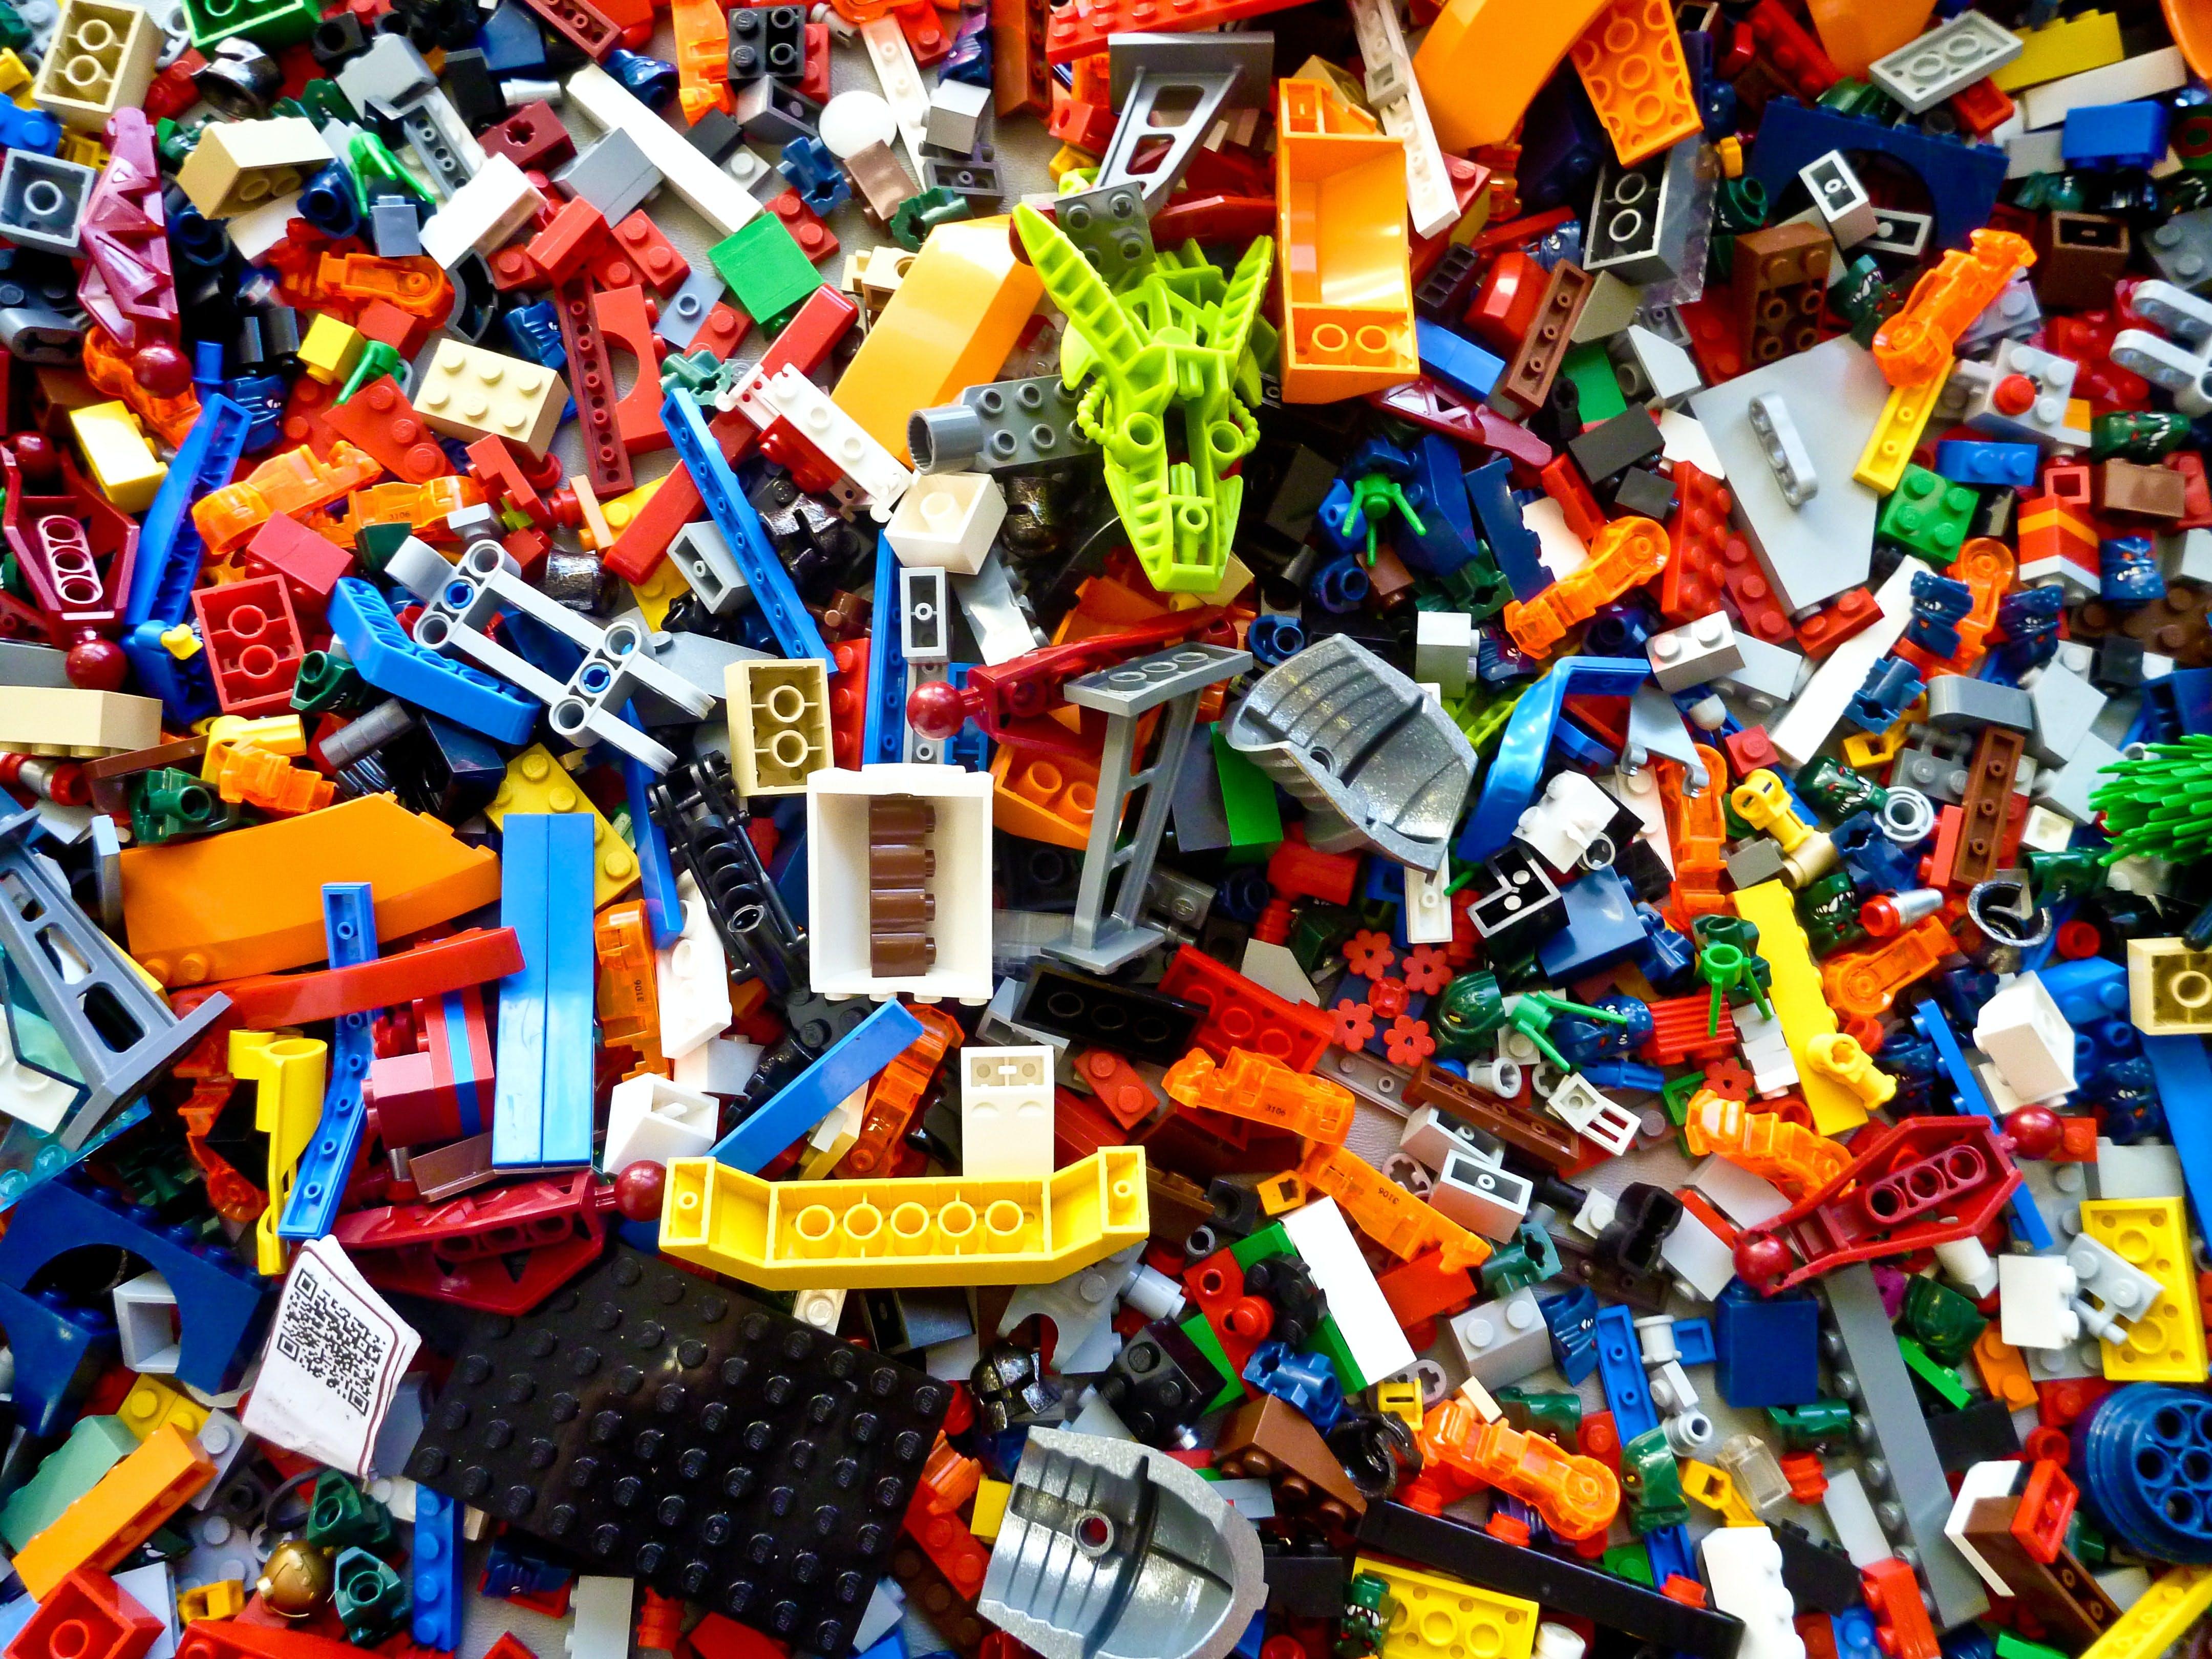 A colorful pile of LEGO bricks